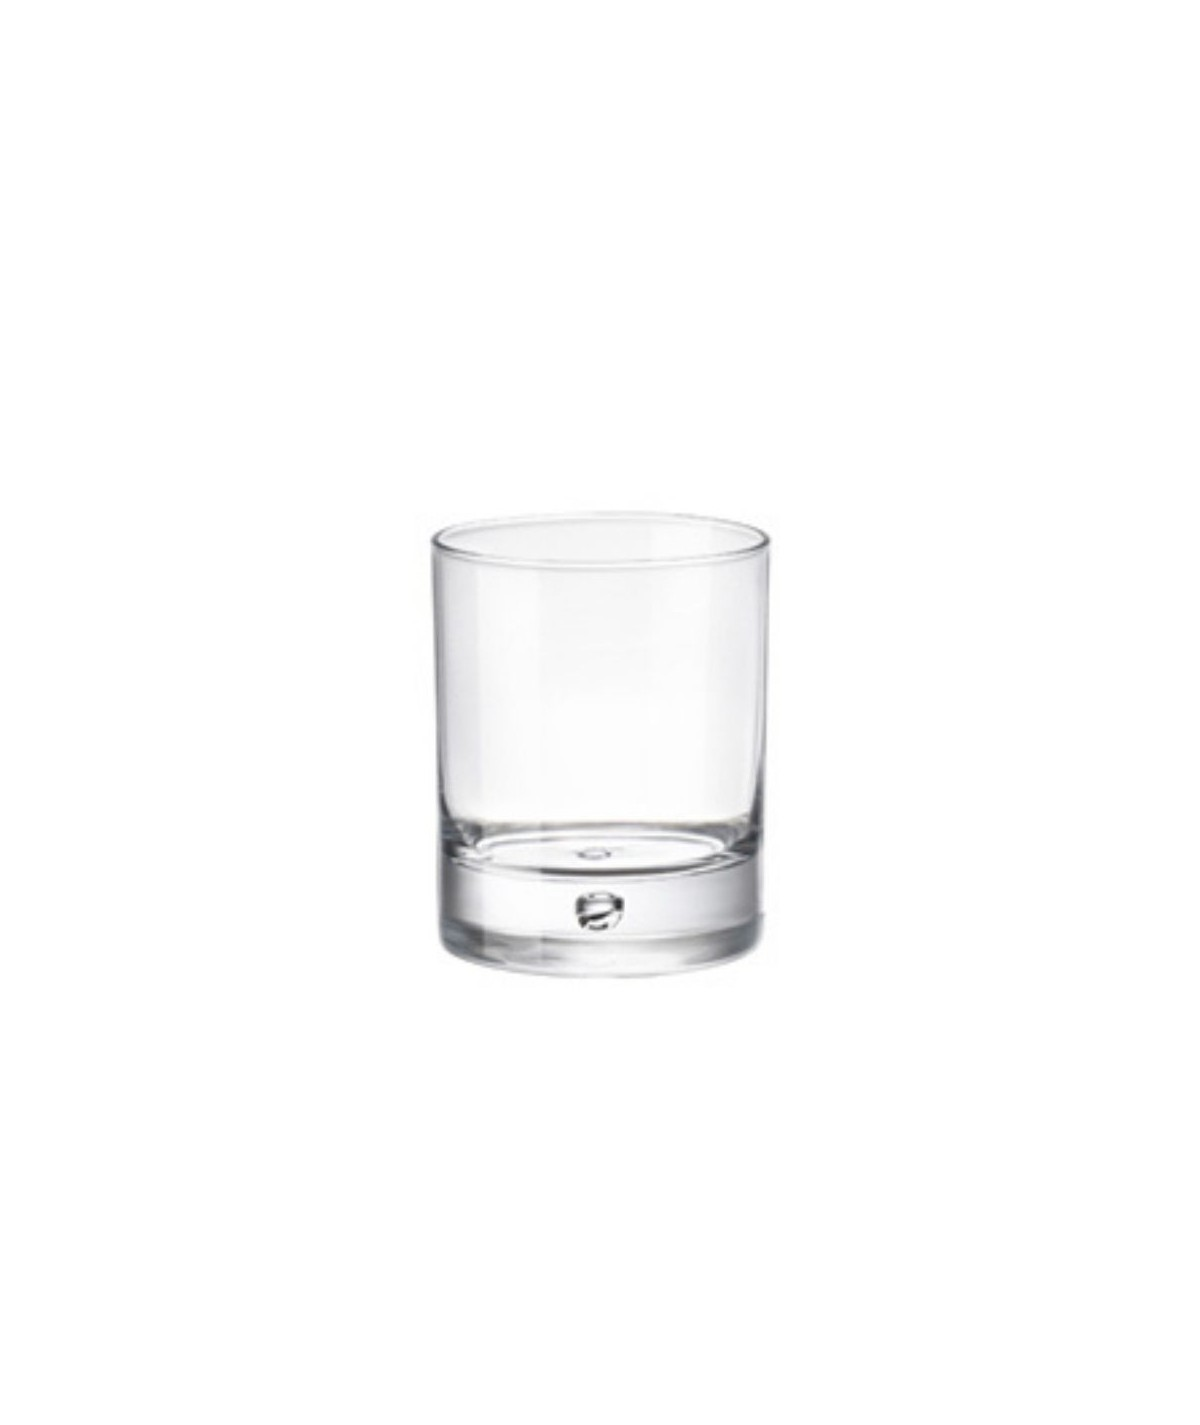 Bicchiere in vetro Juice set 6 pezzi - Bormioli